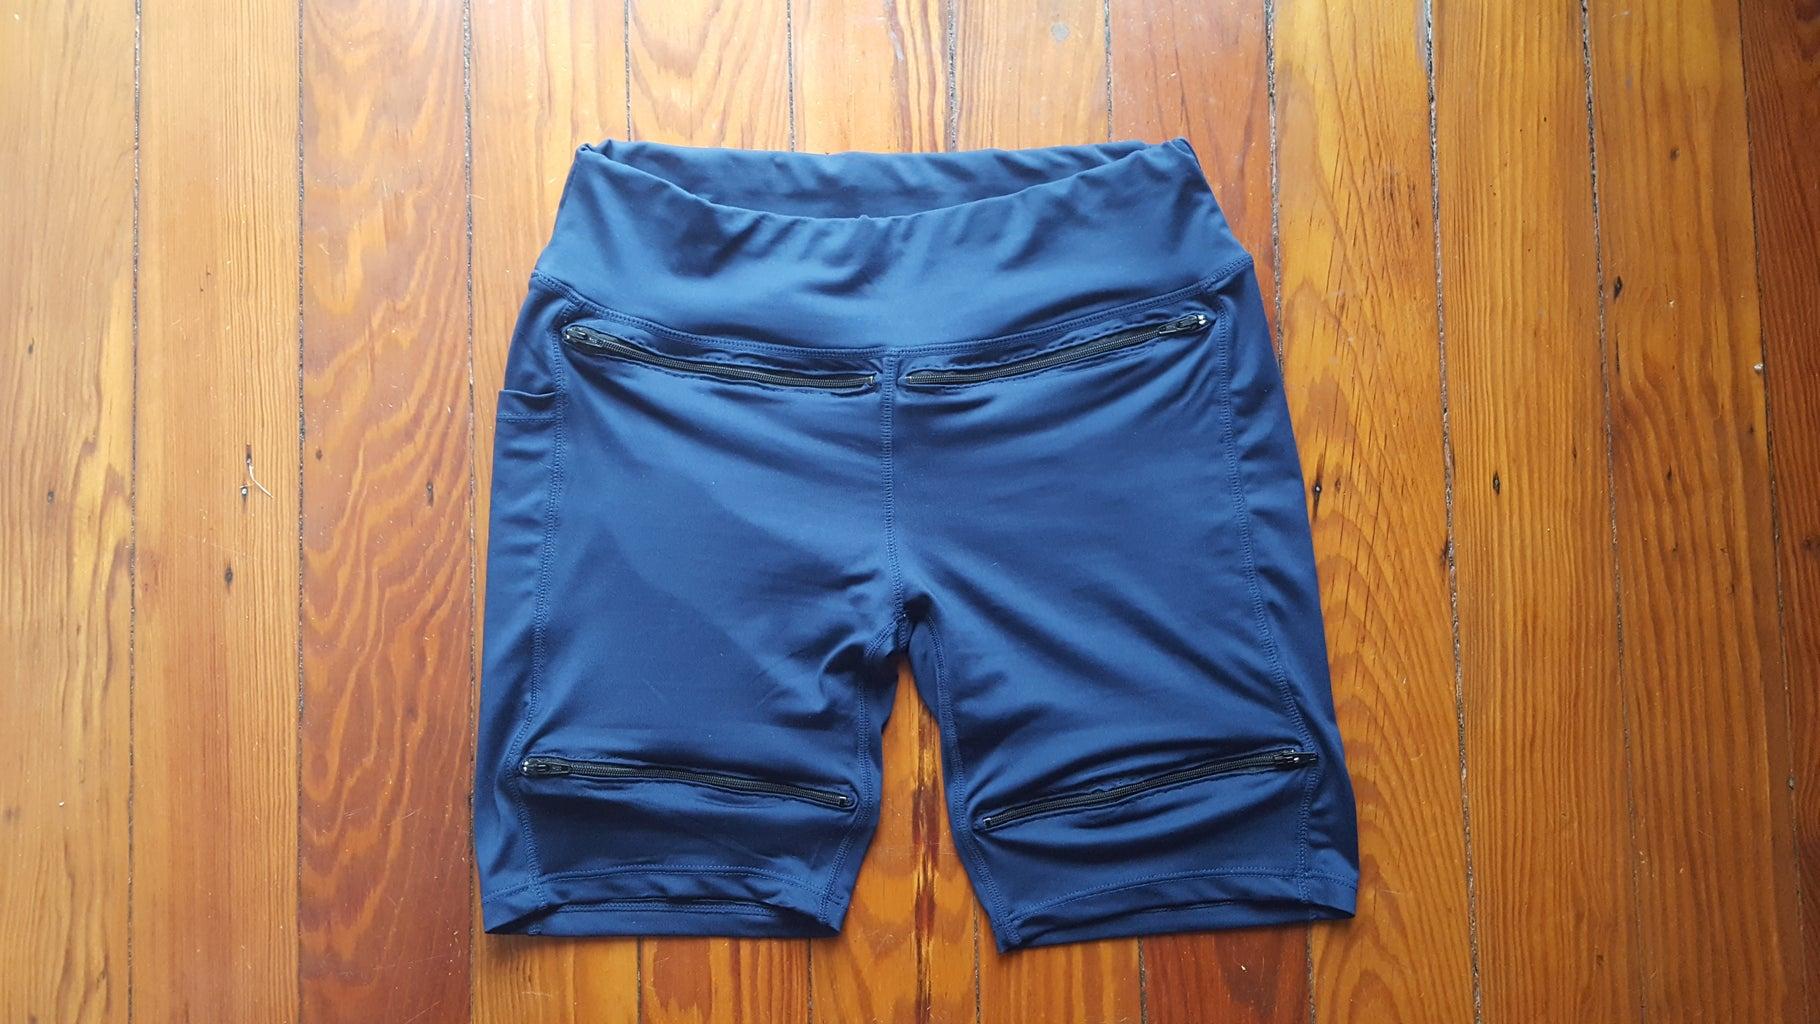 Zipper Pocket Underpants With Bottom Loading Zipper